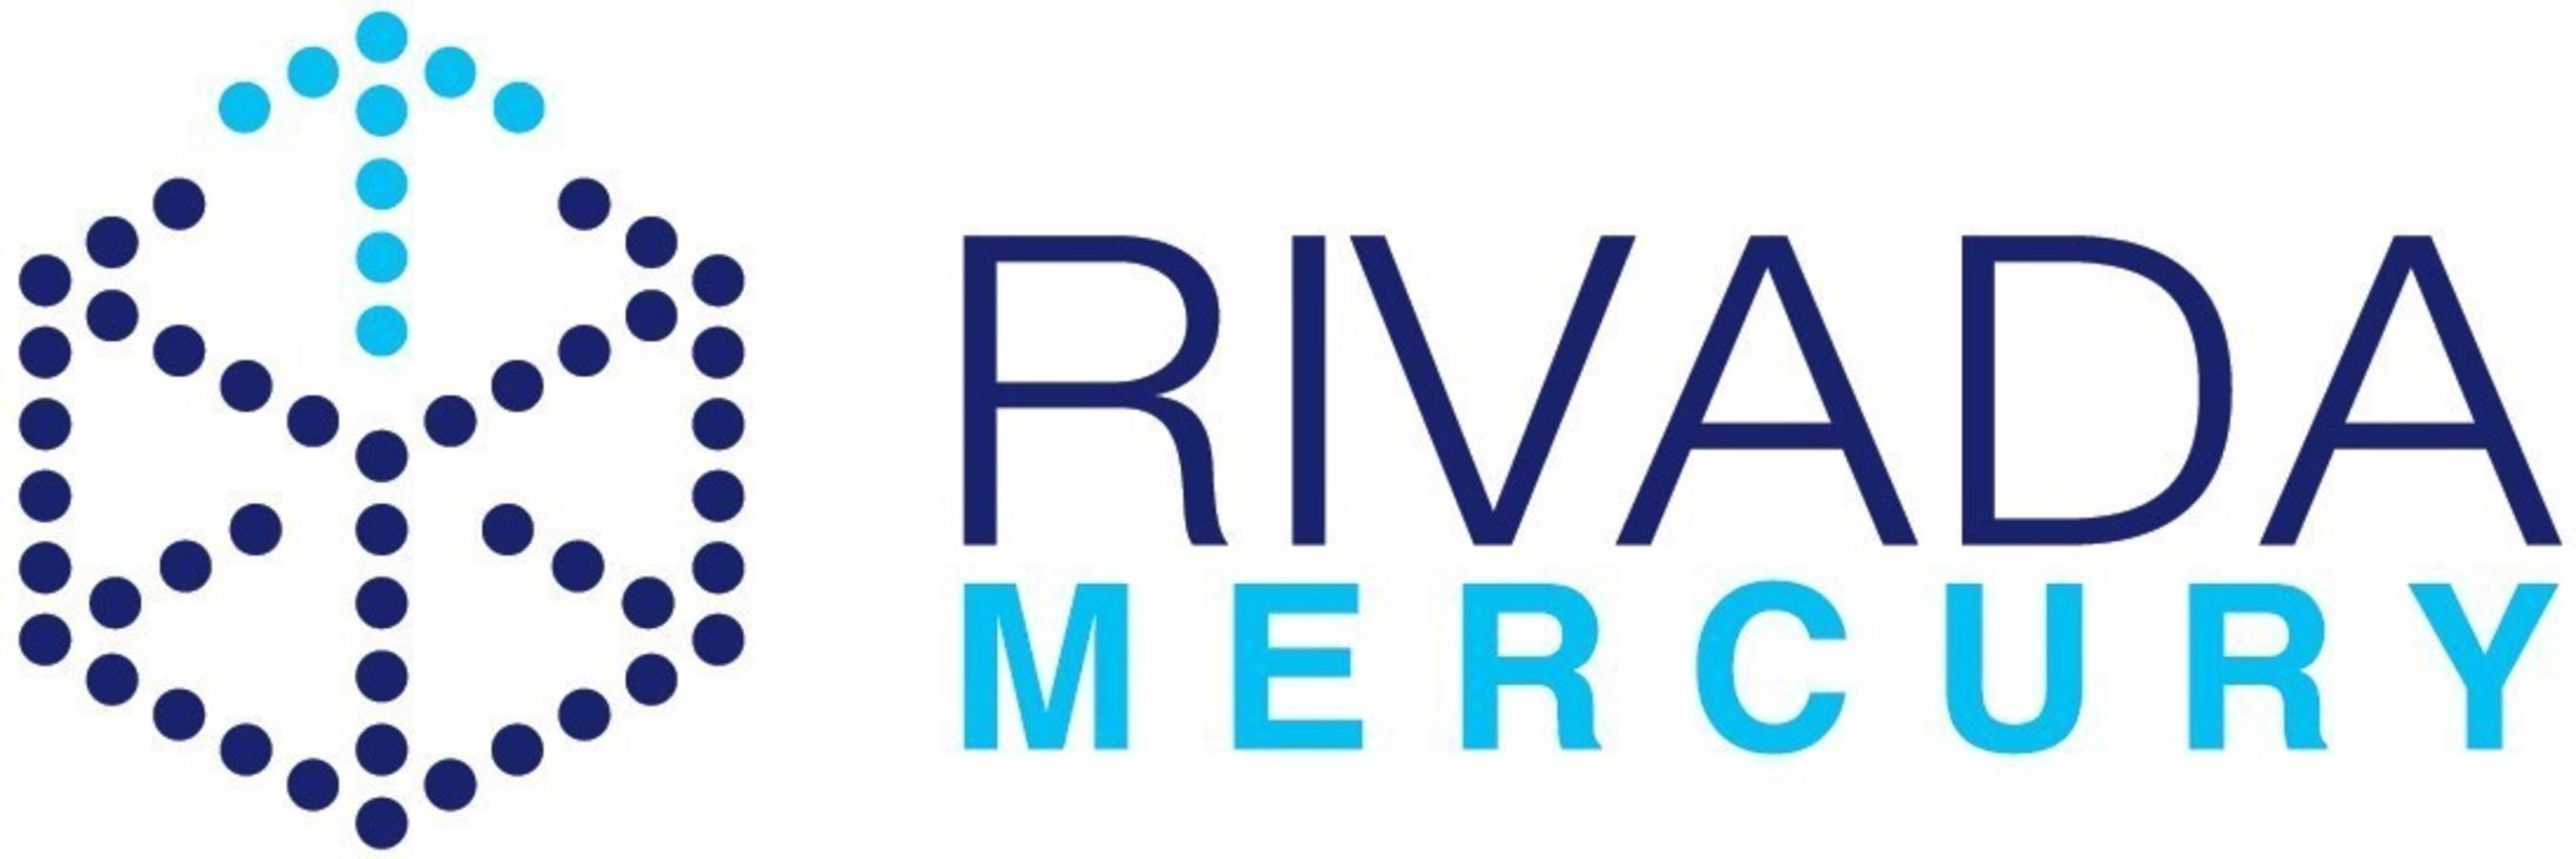 Rivada Mercury